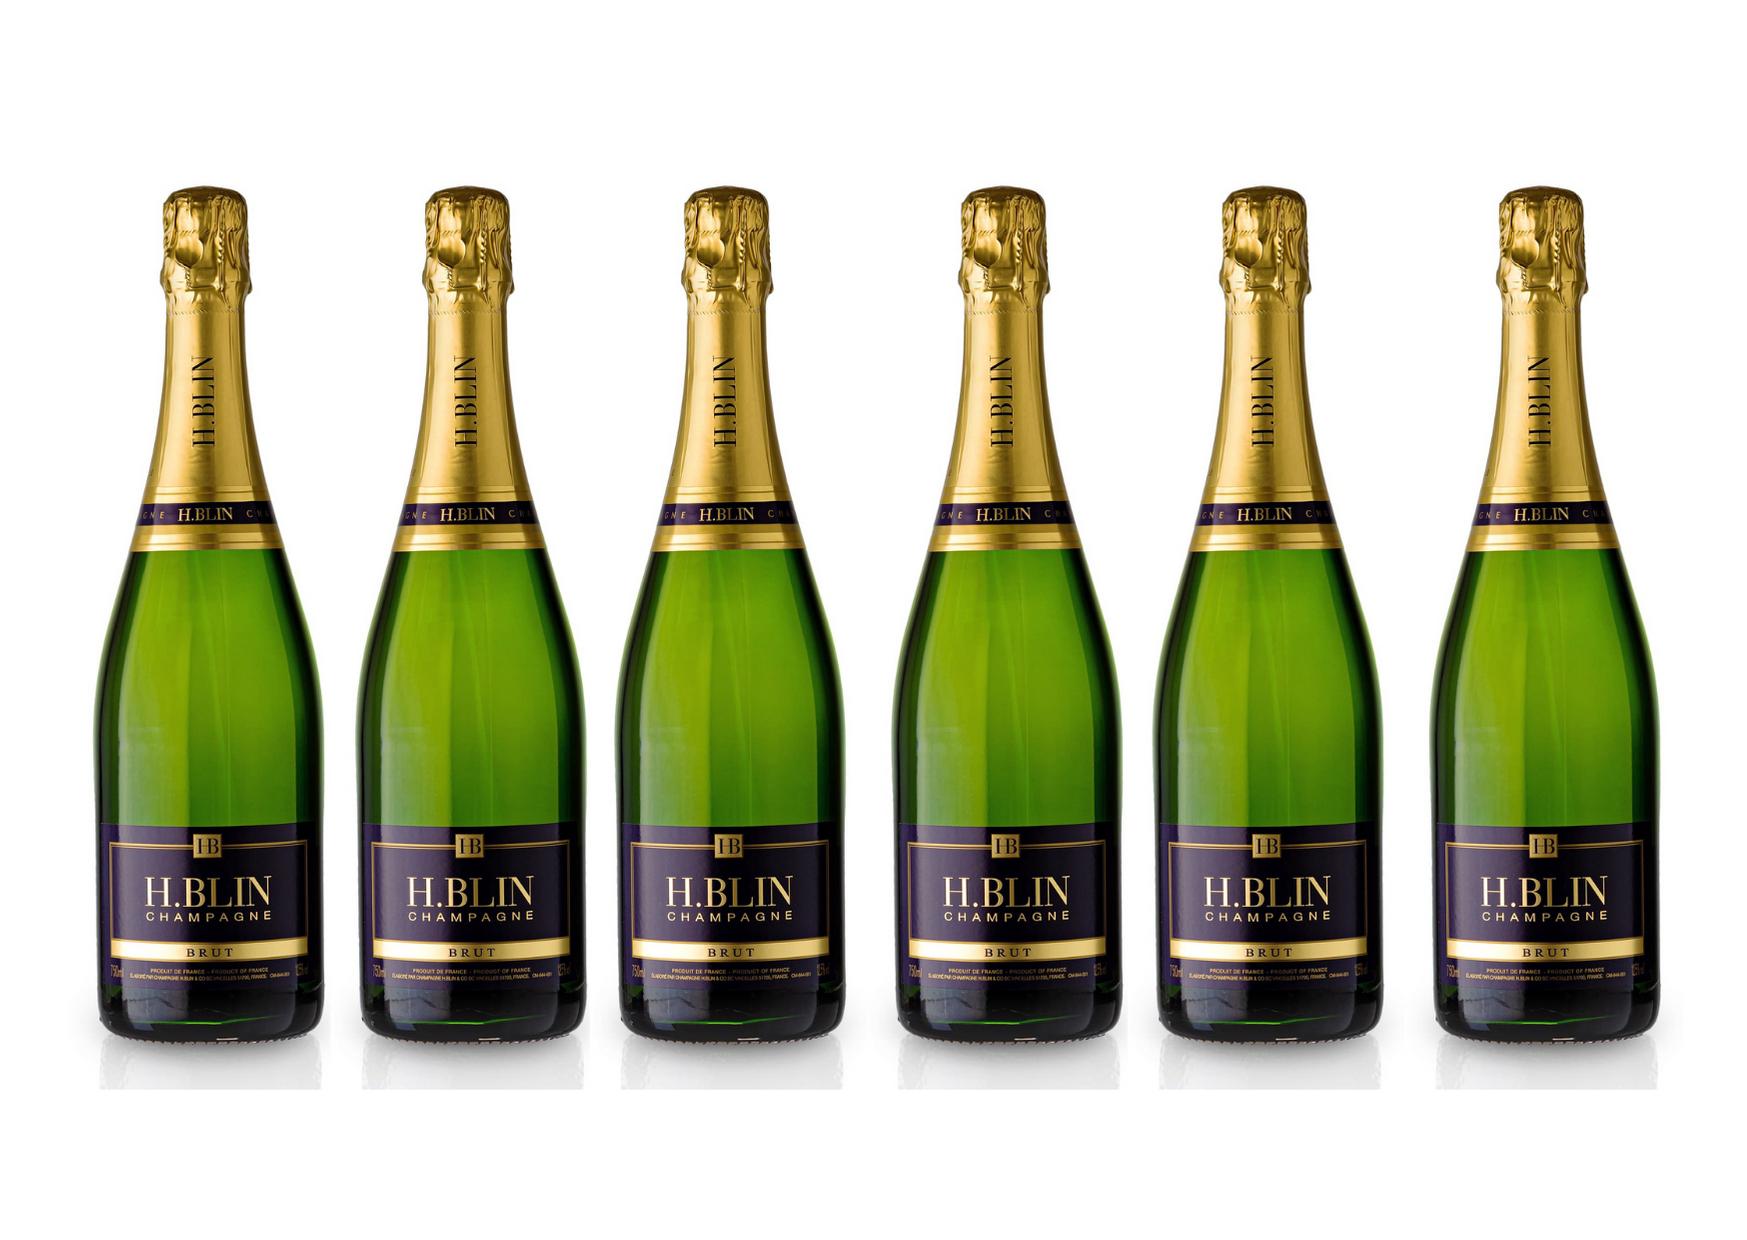 Champagner H.Blin Brut (91/100 Wine Spectator) aus dem Marnetal | 6x 0,75 L